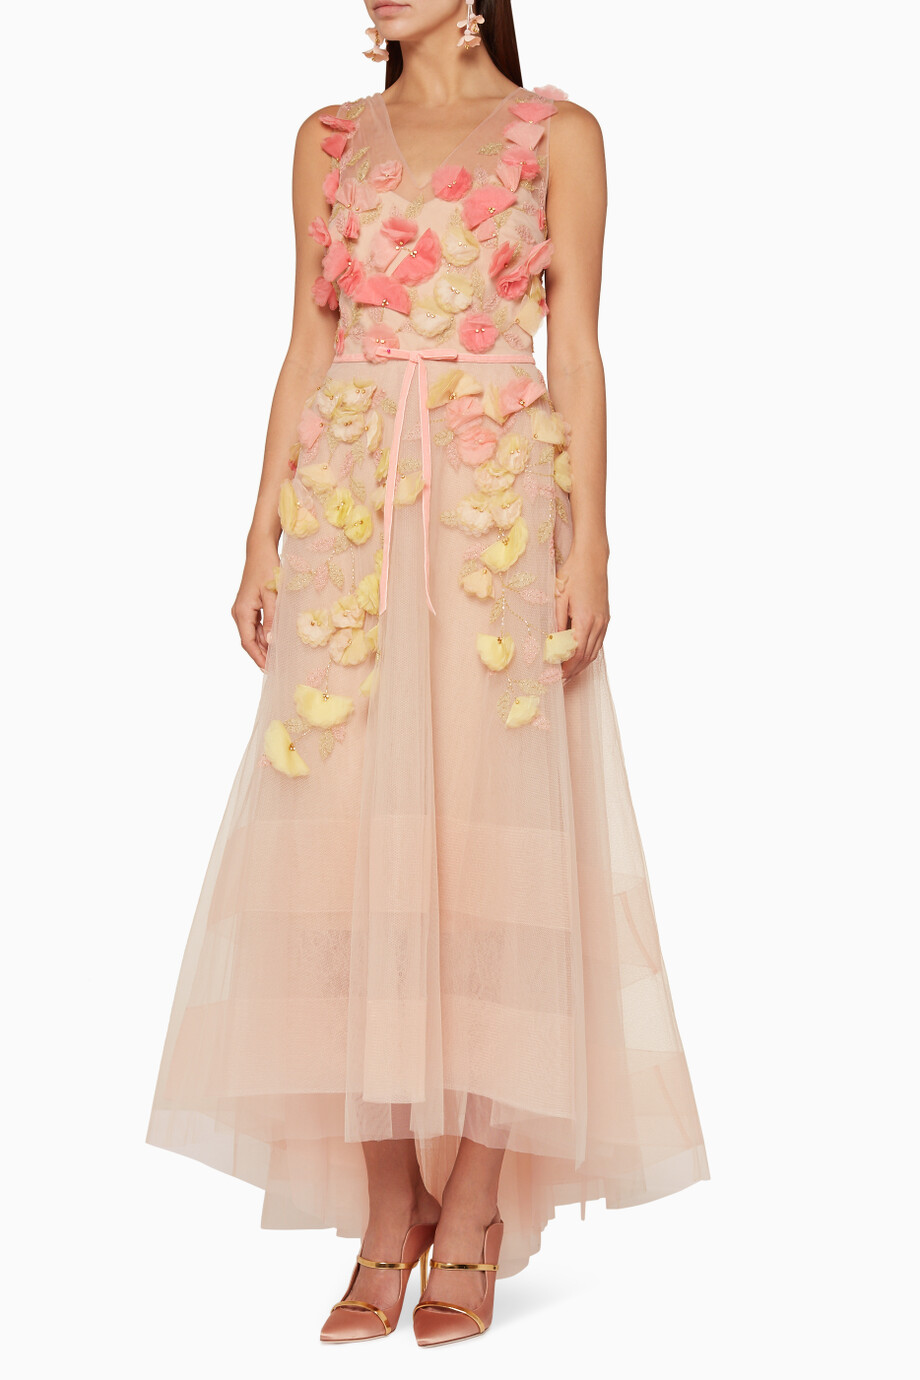 767d0a2e Shop Marchesa Notte Pink Pastel-Pink 3D Flower Embellished Gown for ...